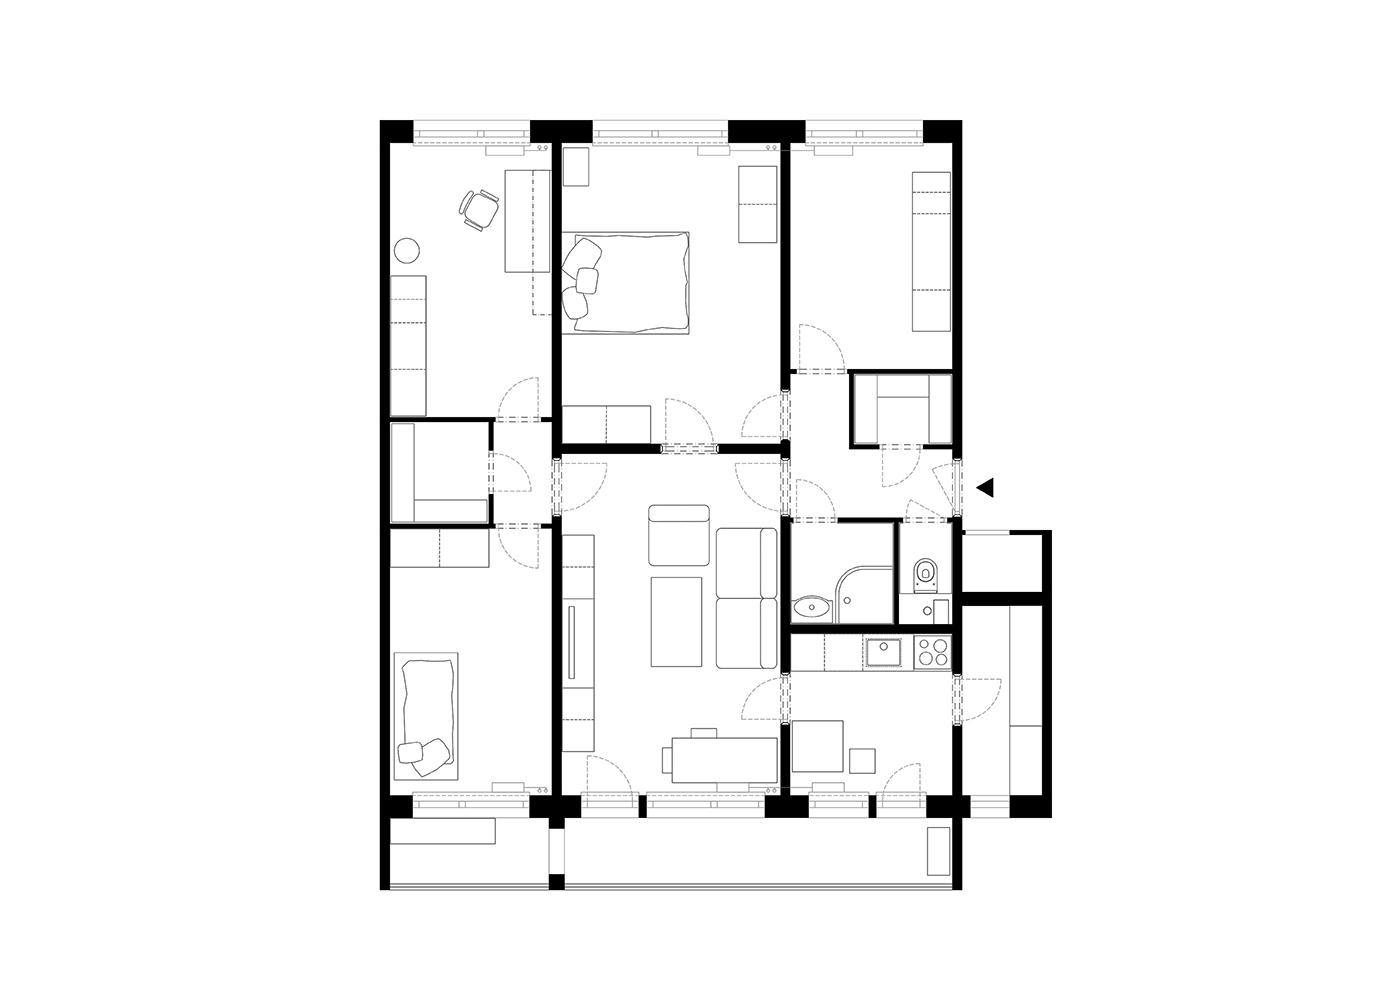 noiz-architekti-bratislava-pod-rovnicami-06